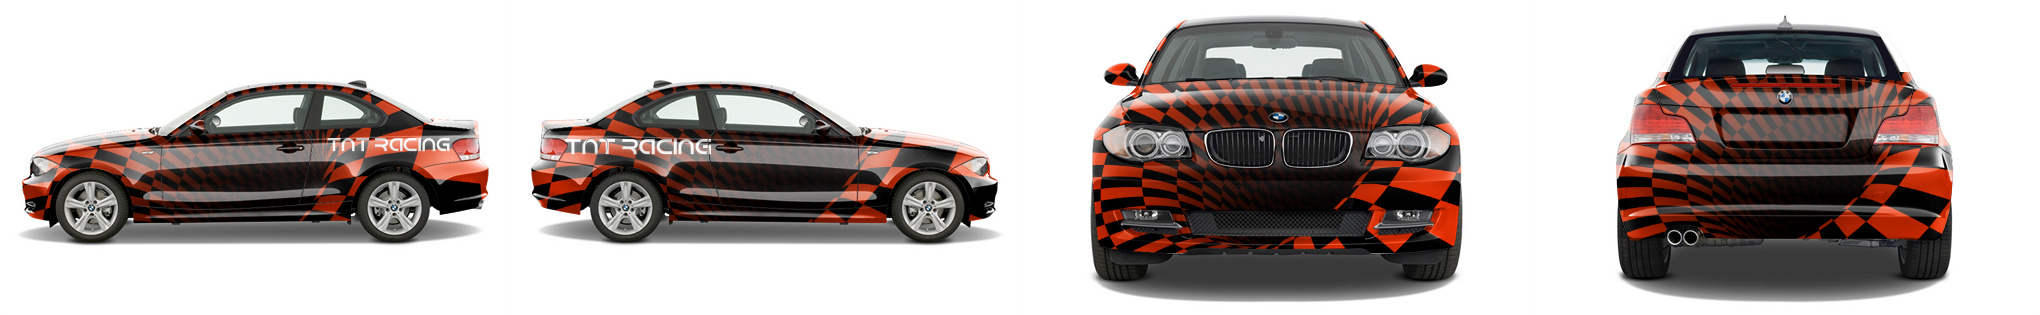 Sports Coupe Wrap #48585